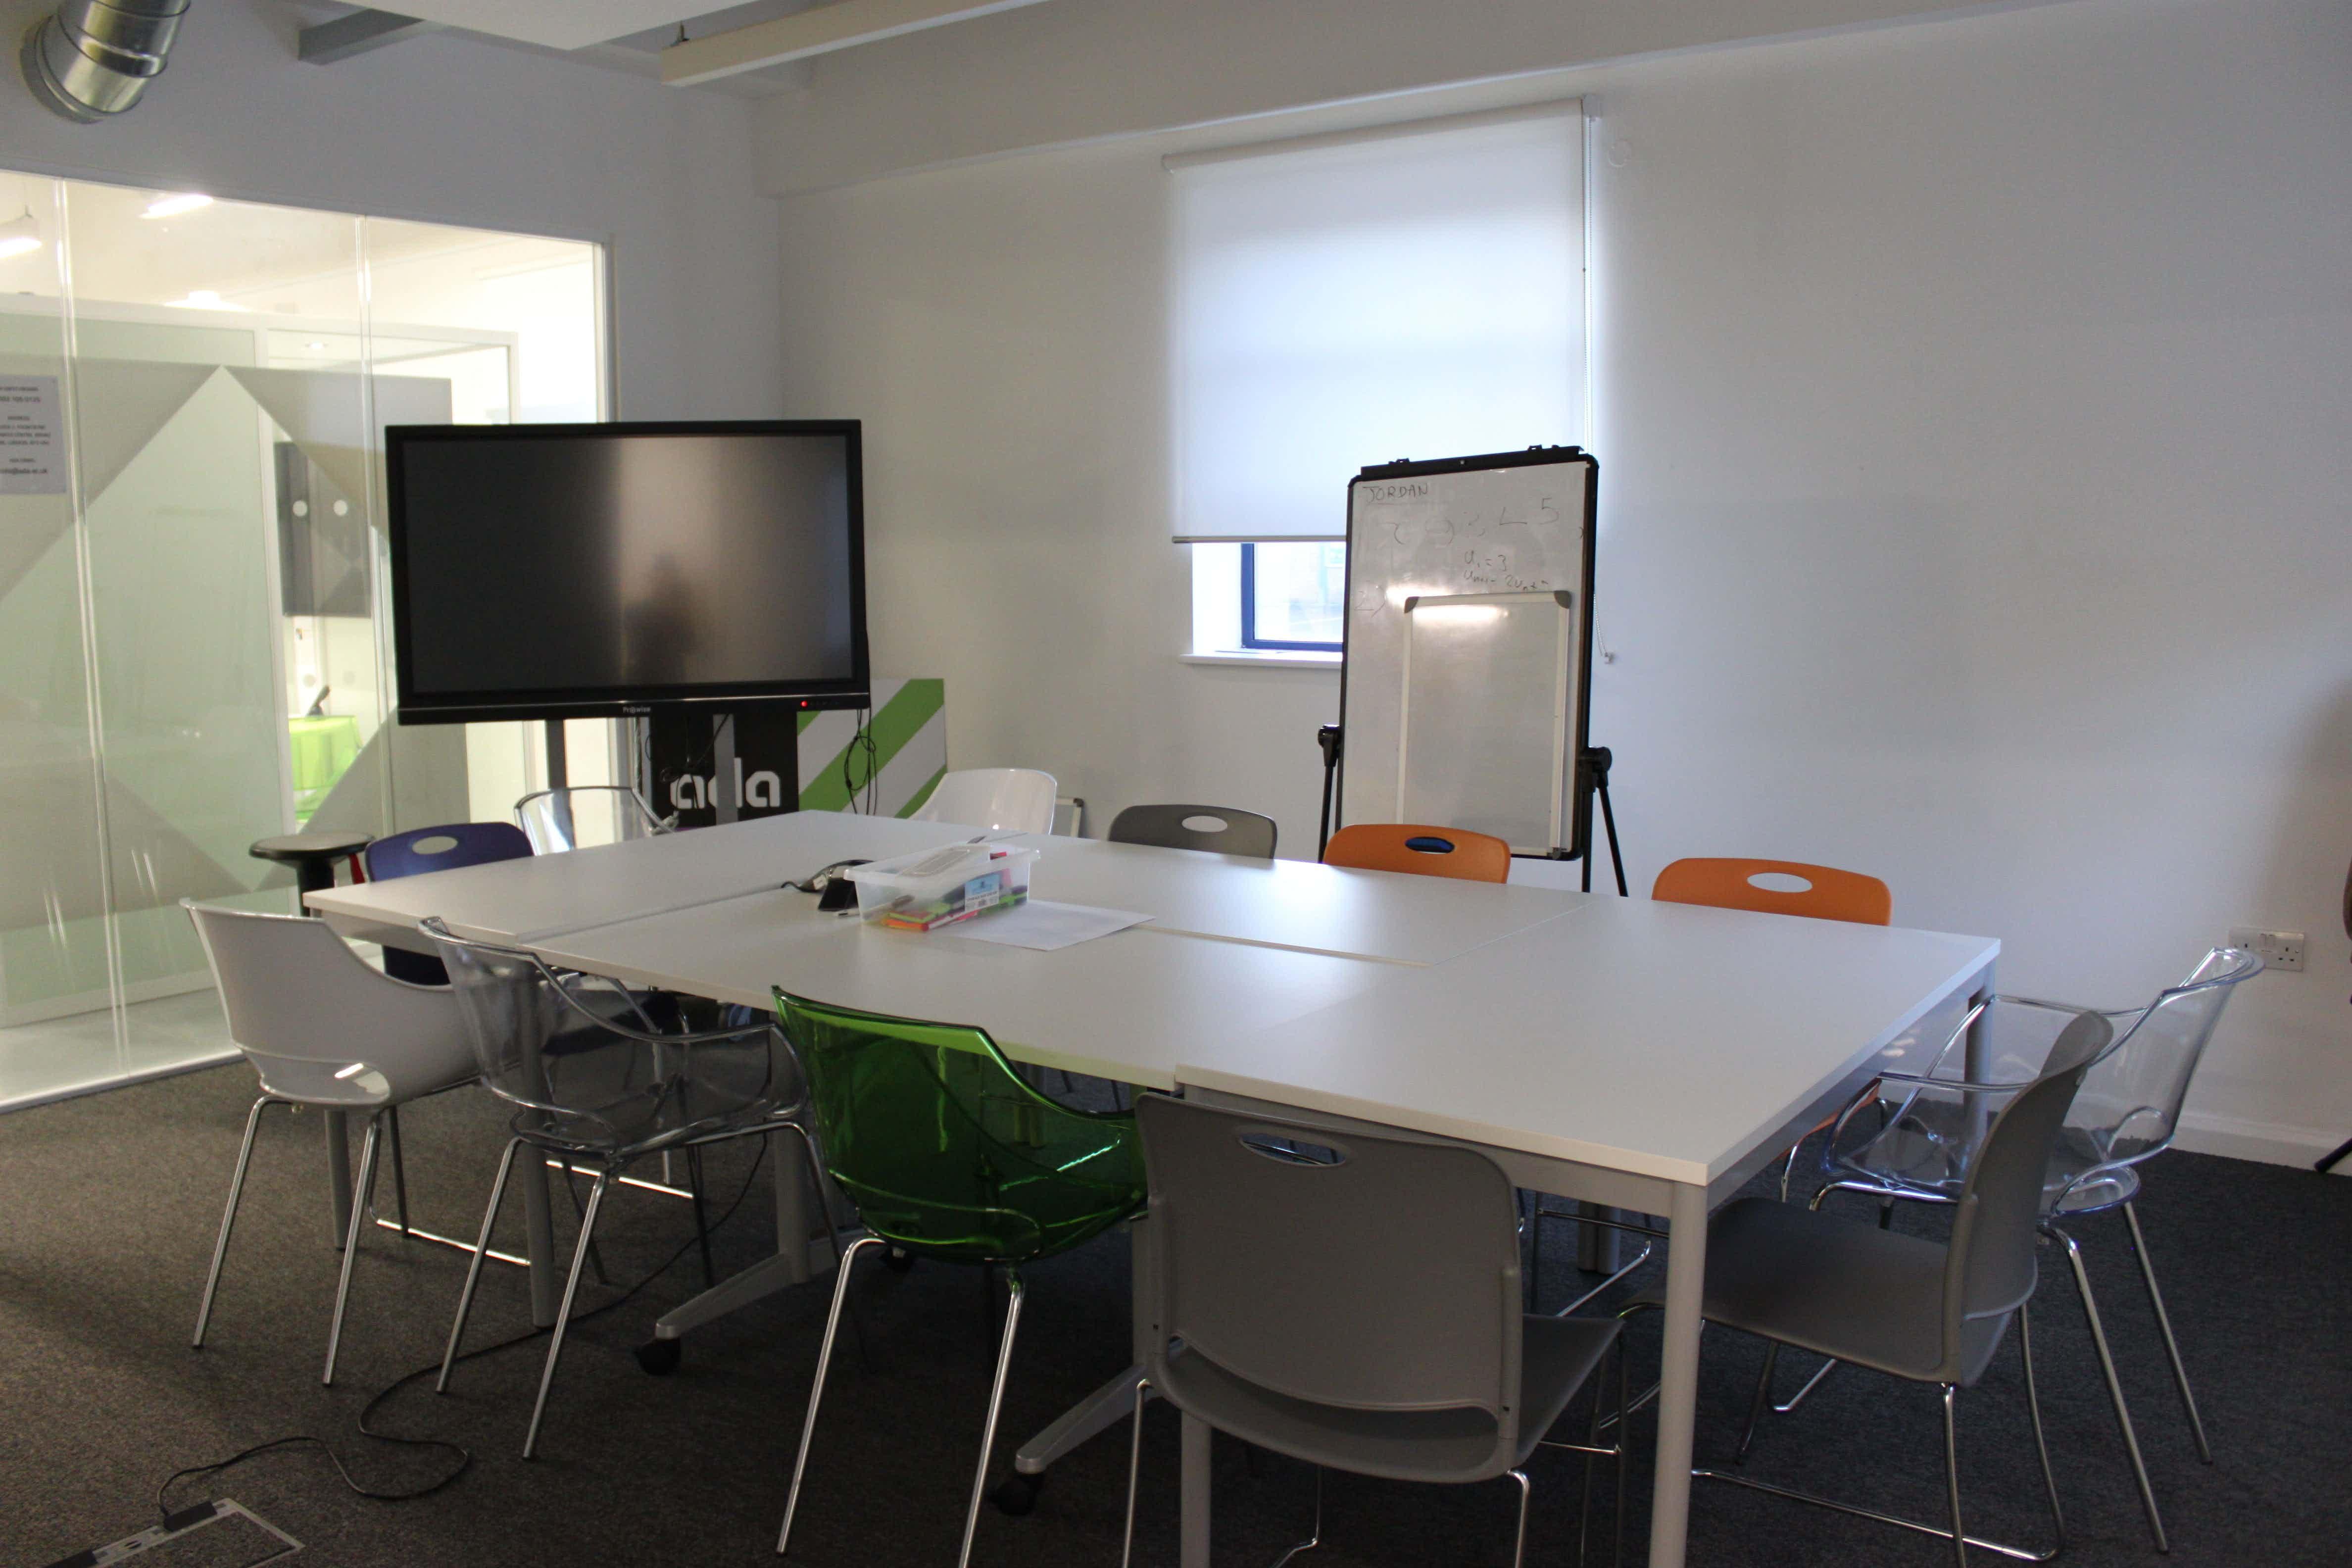 Python Boardroom, Ada National College for Digital Skills